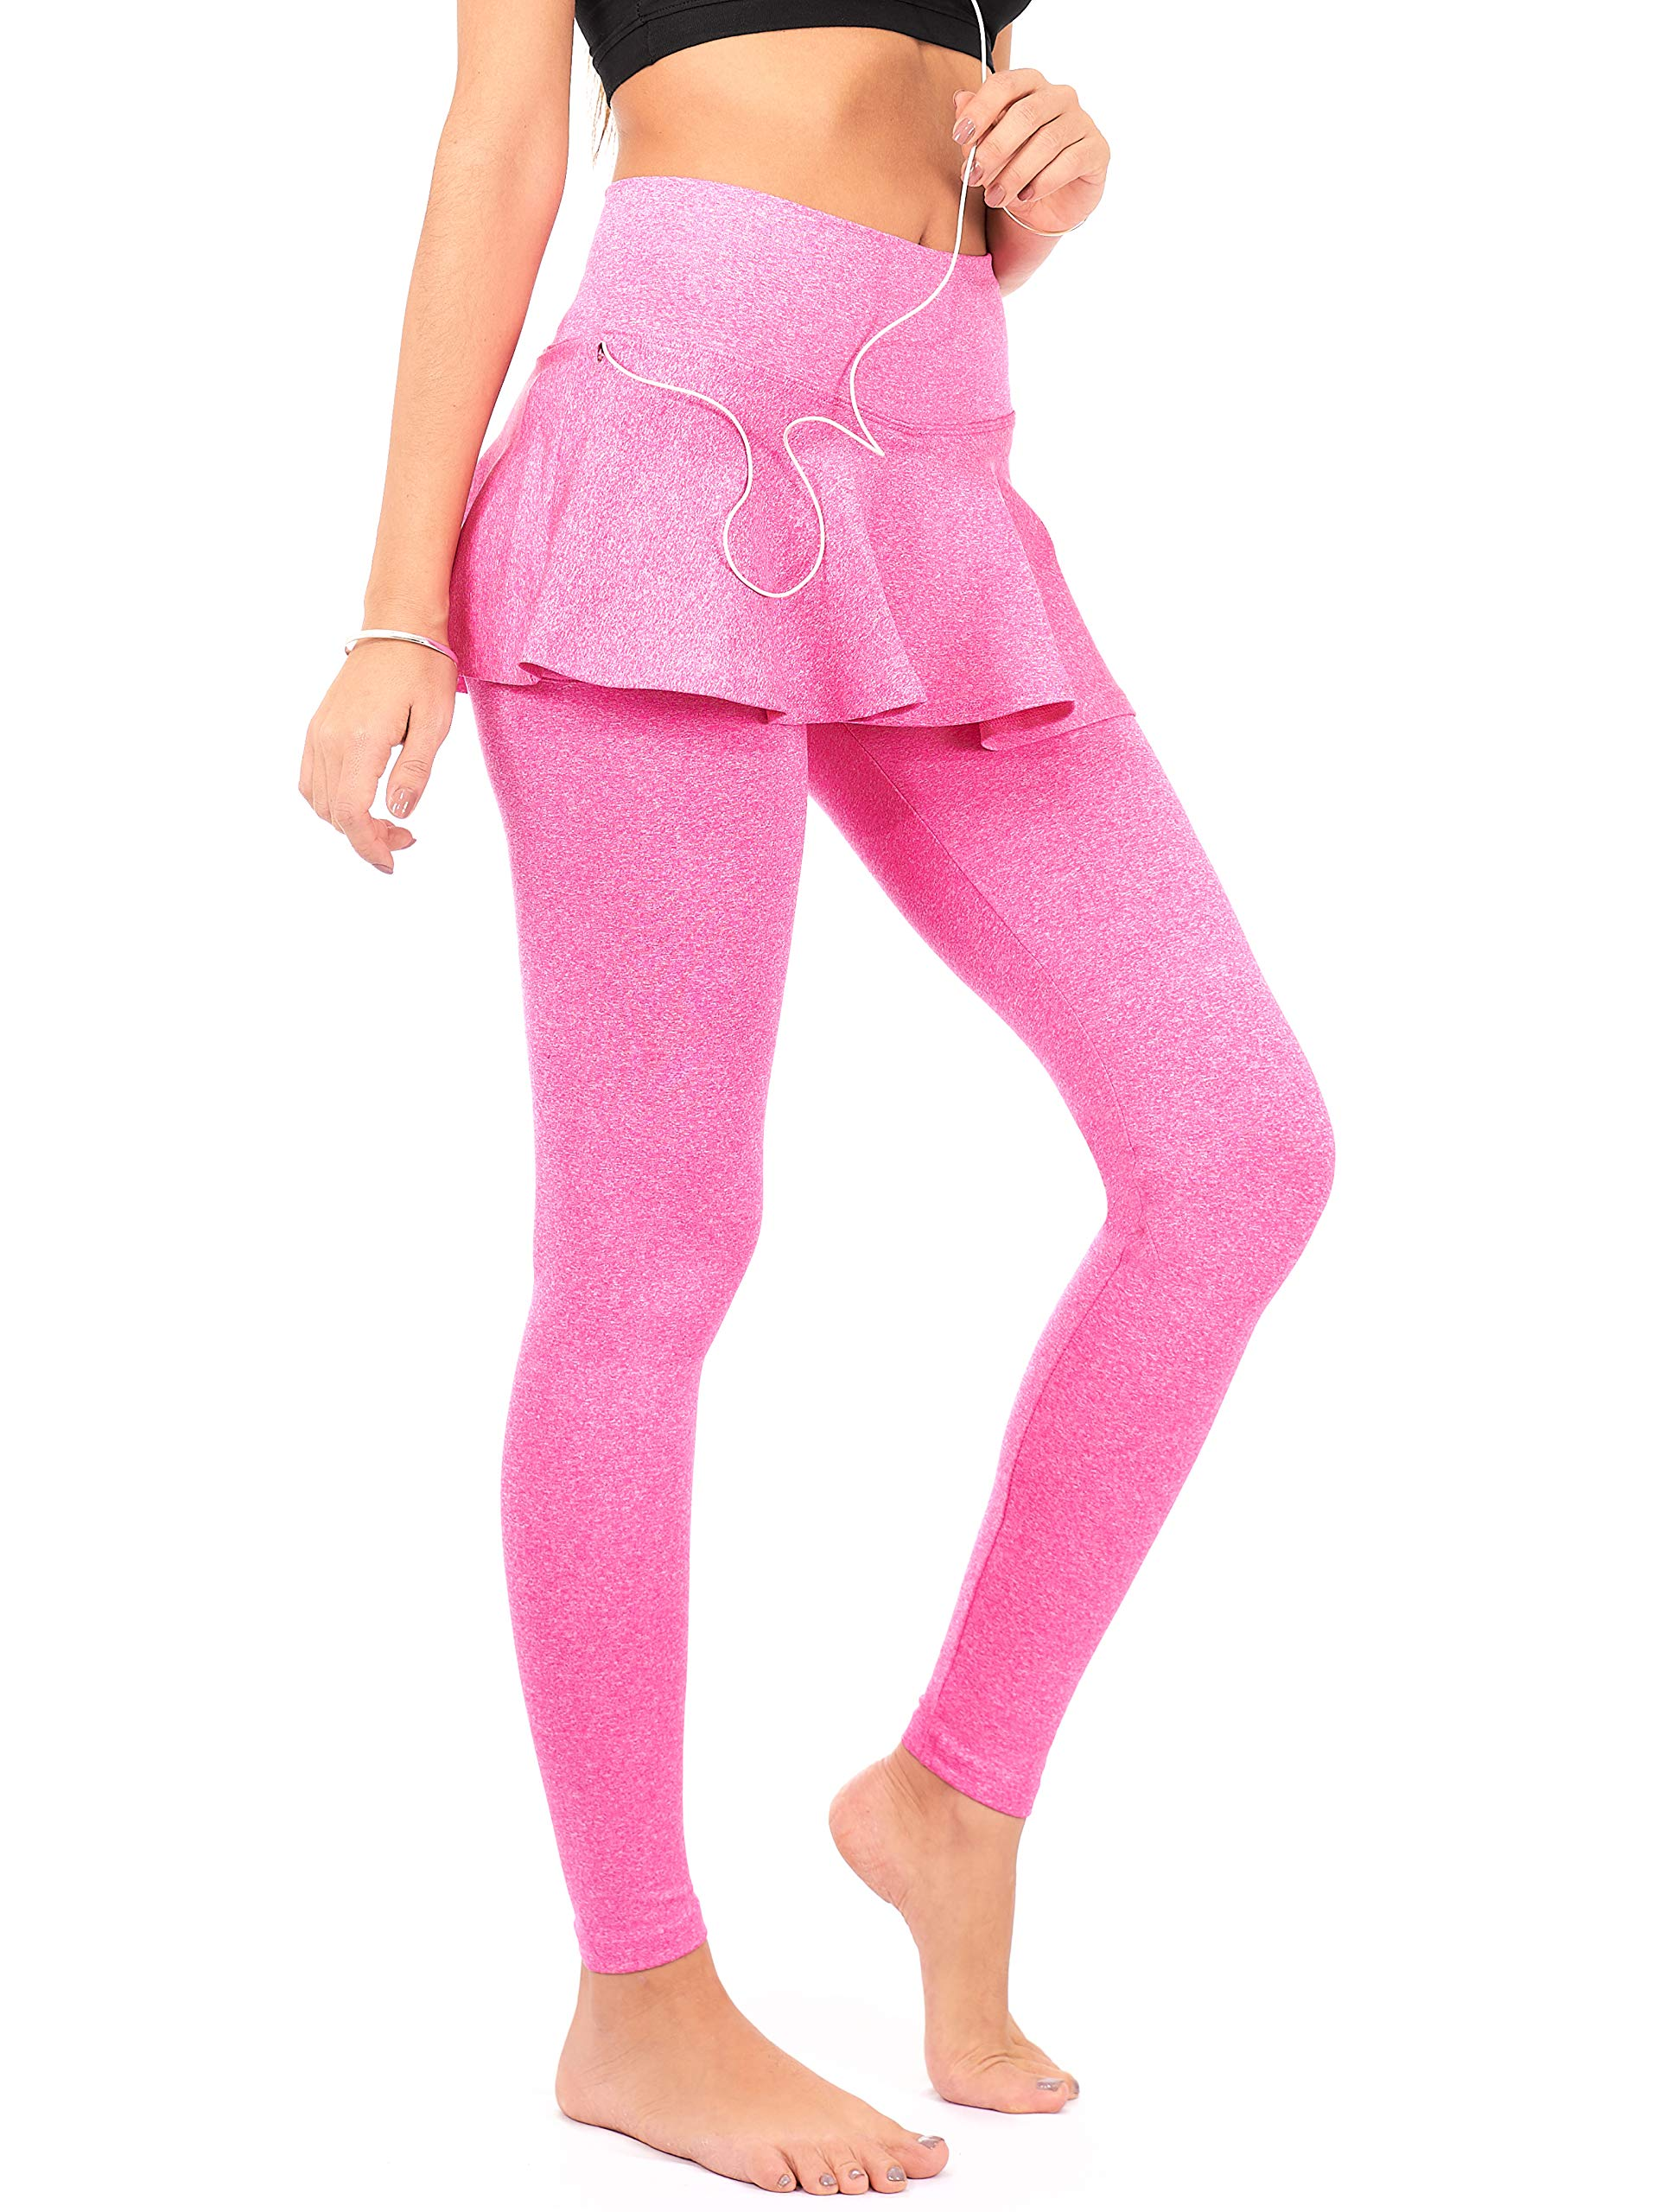 DEAR SPARKLE Skirted Leggings for Women | Yoga Tennis Golf Pants with Skirt Pockets + Plus Size (S9)